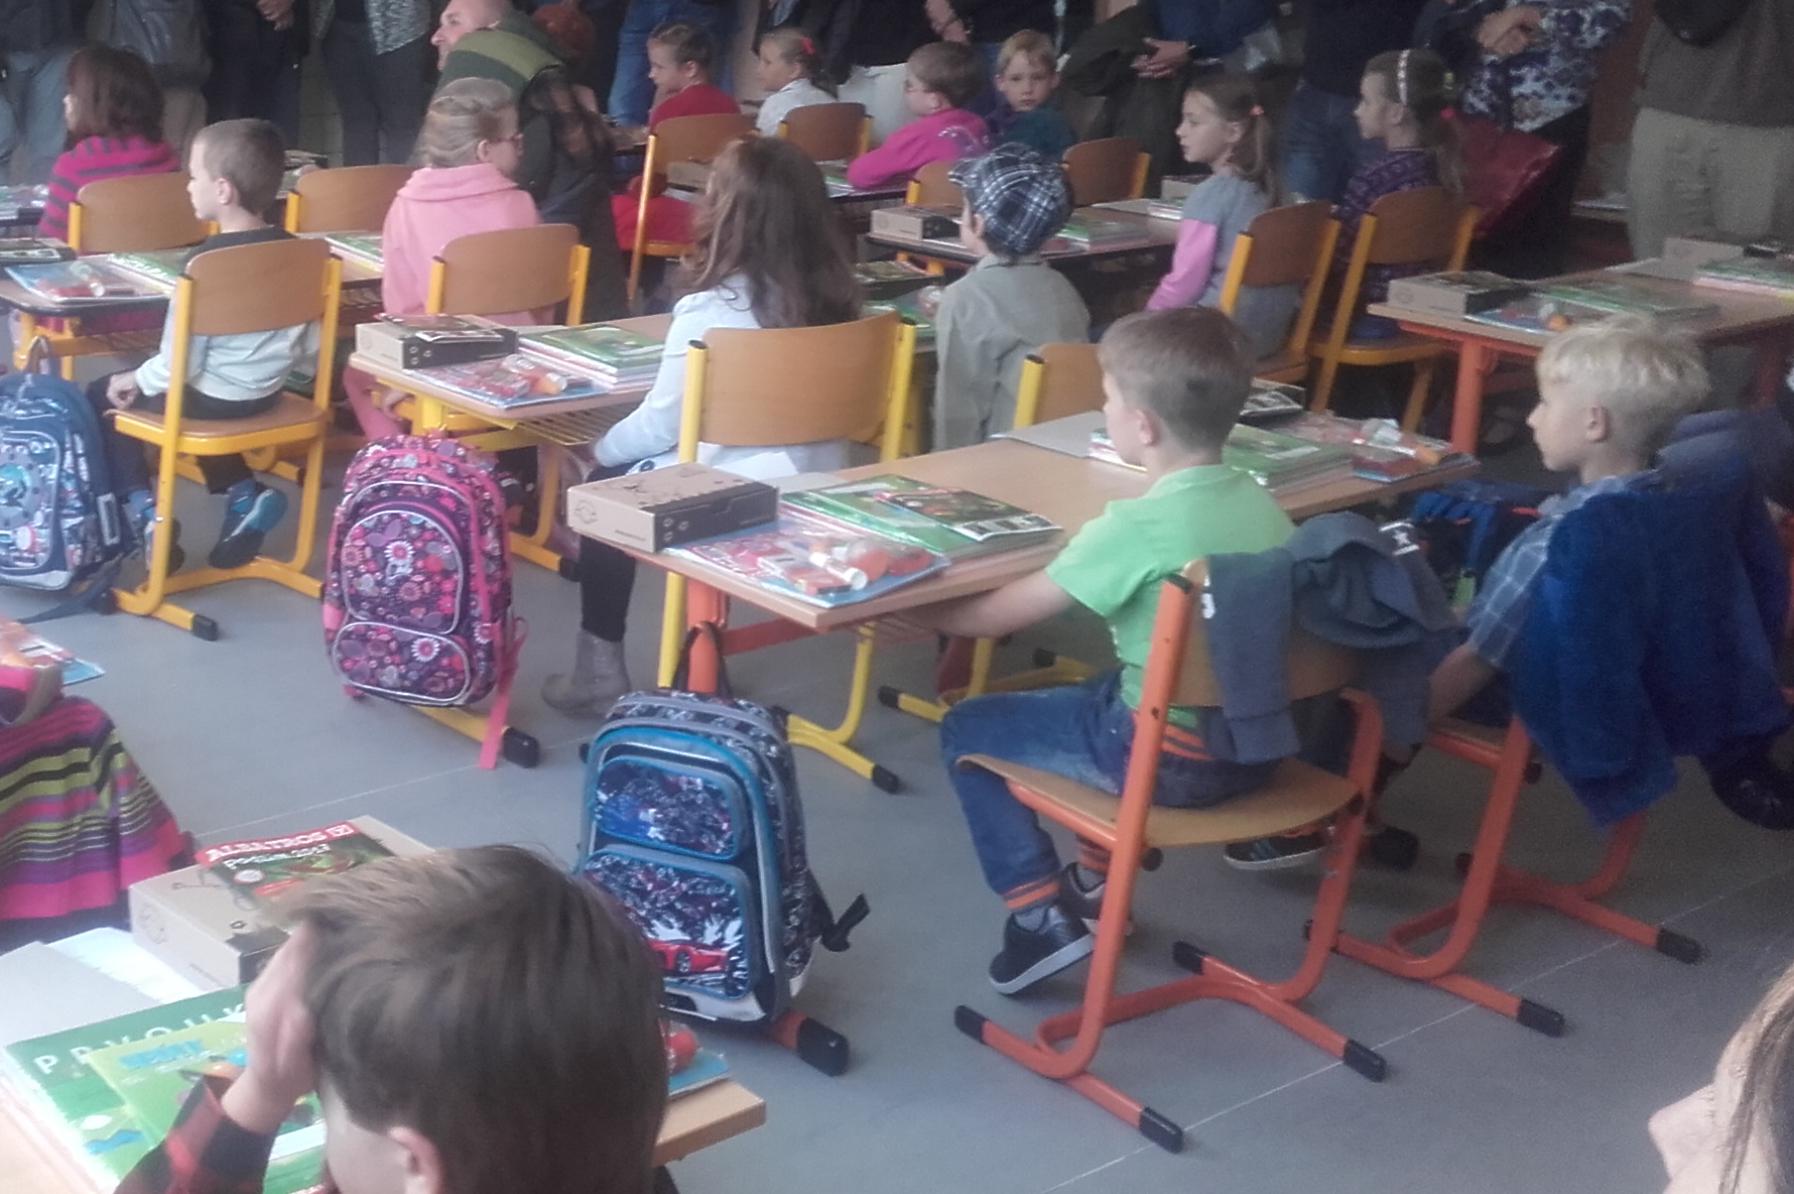 Kraj podporuje programy primární prevence na školách